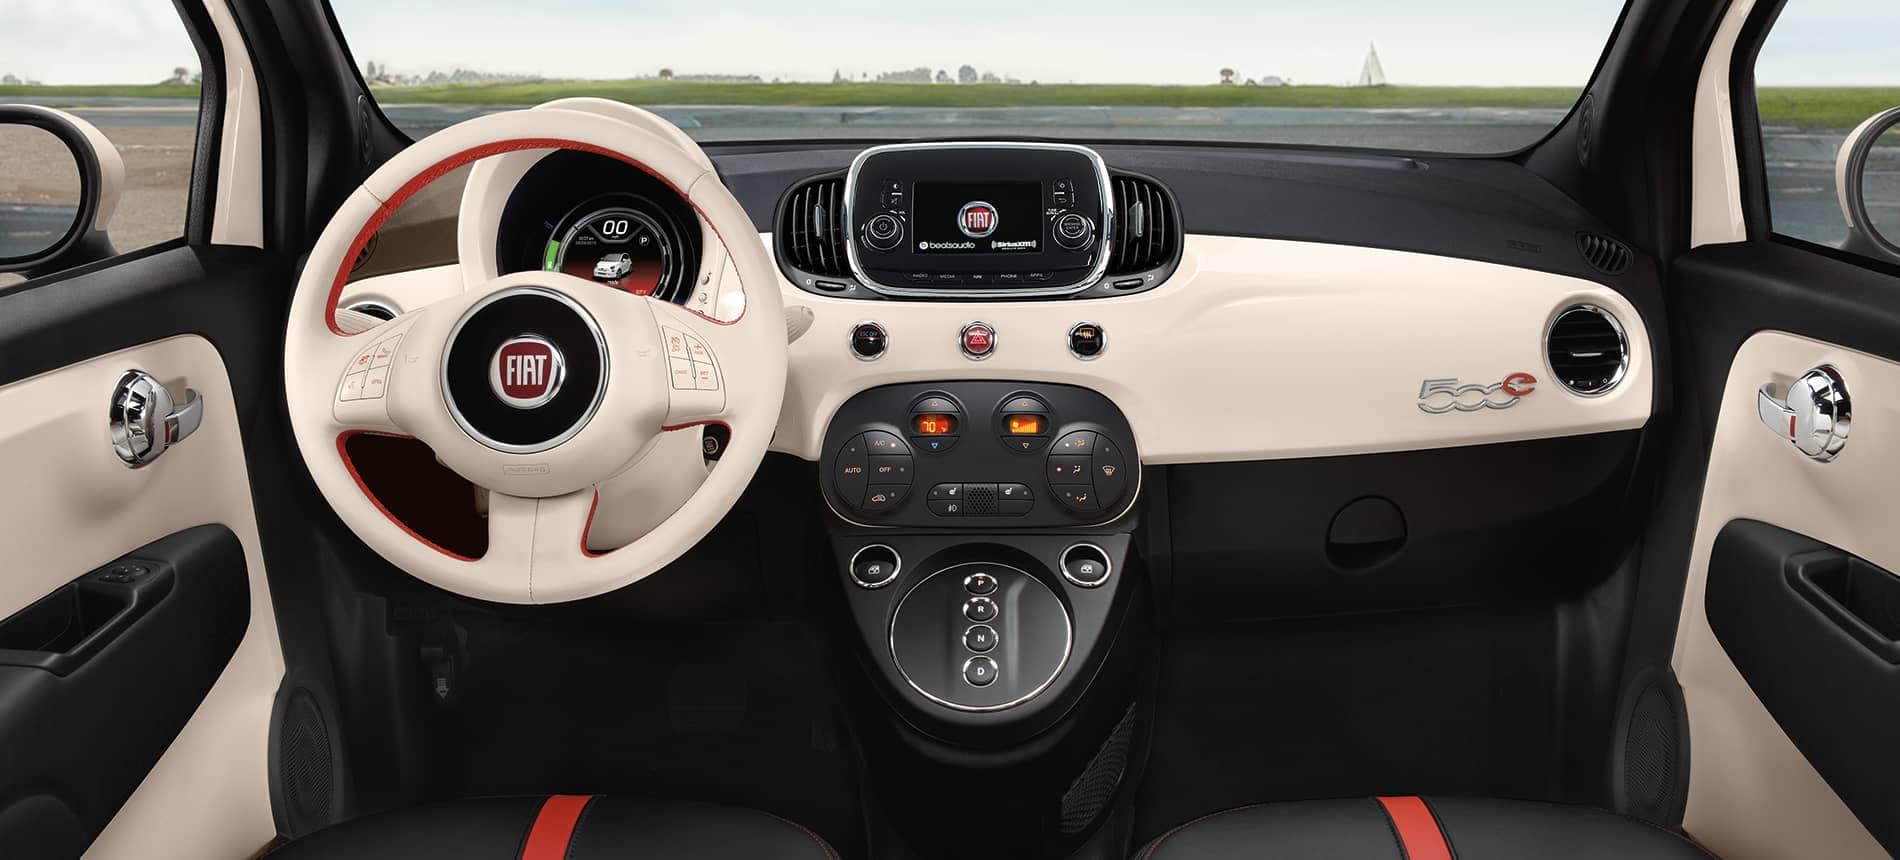 Hyundai Elantra: TPMS (Tire pressure monitoring system) malfunction indicator (if equipped)